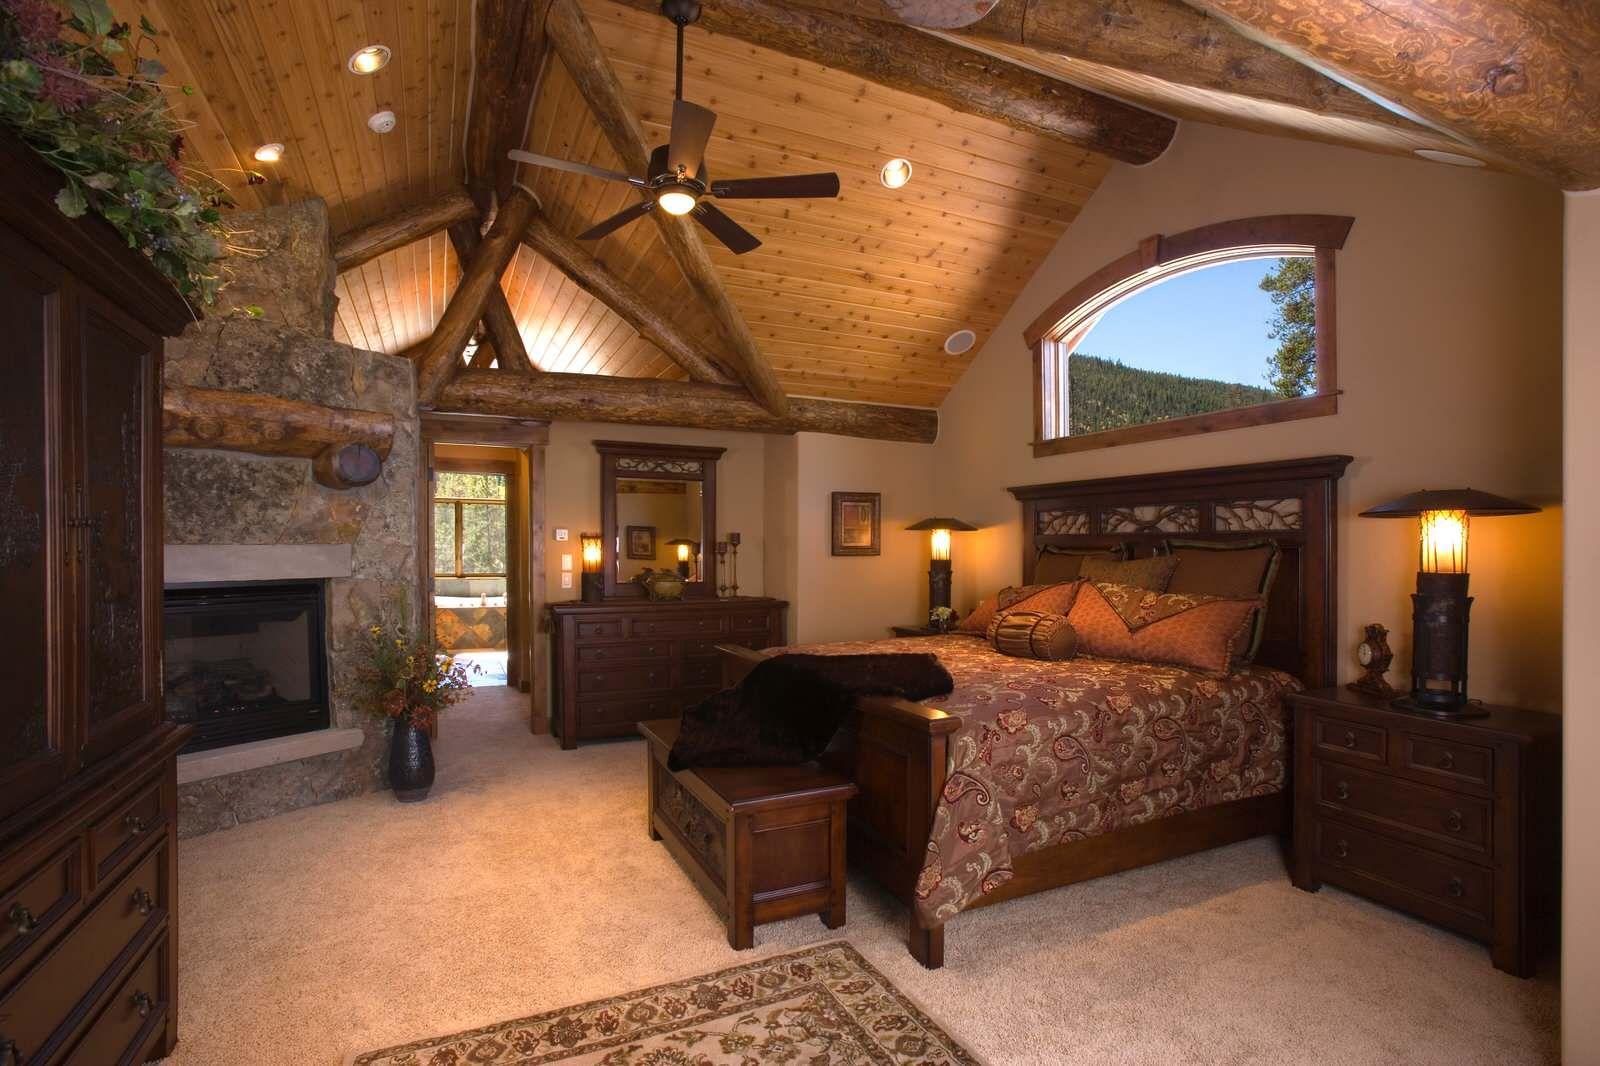 24 Beautiful Rustic Bedroom Designs